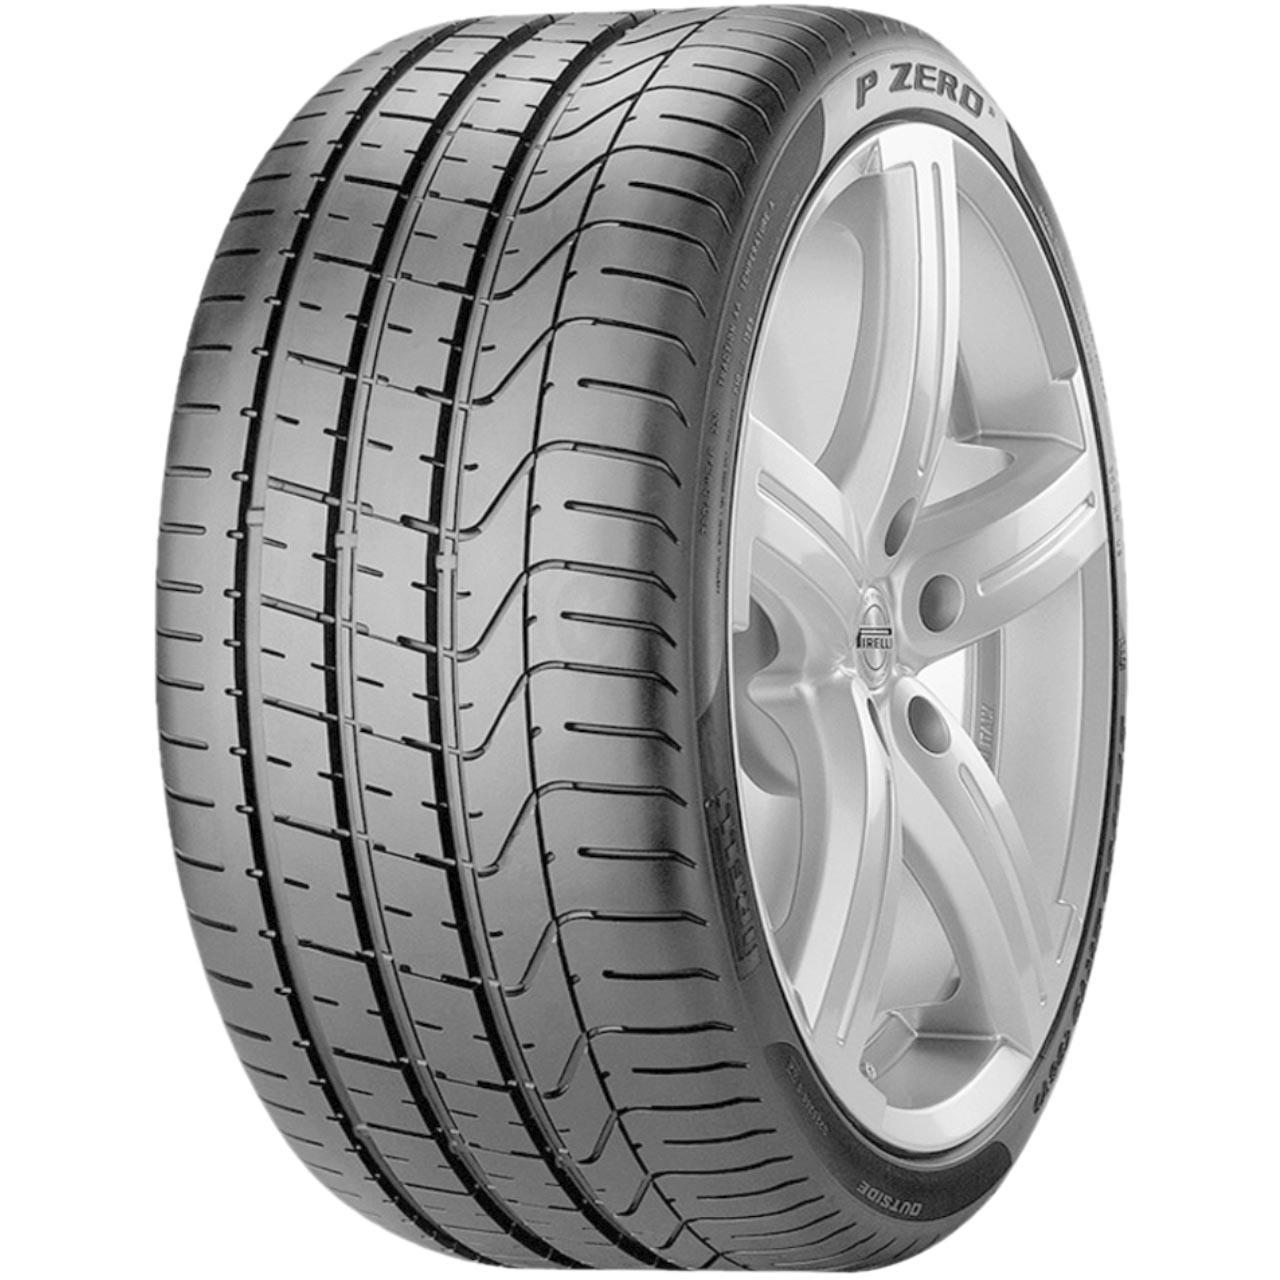 Pirelli Pzero 225/45ZR17 94Y XL